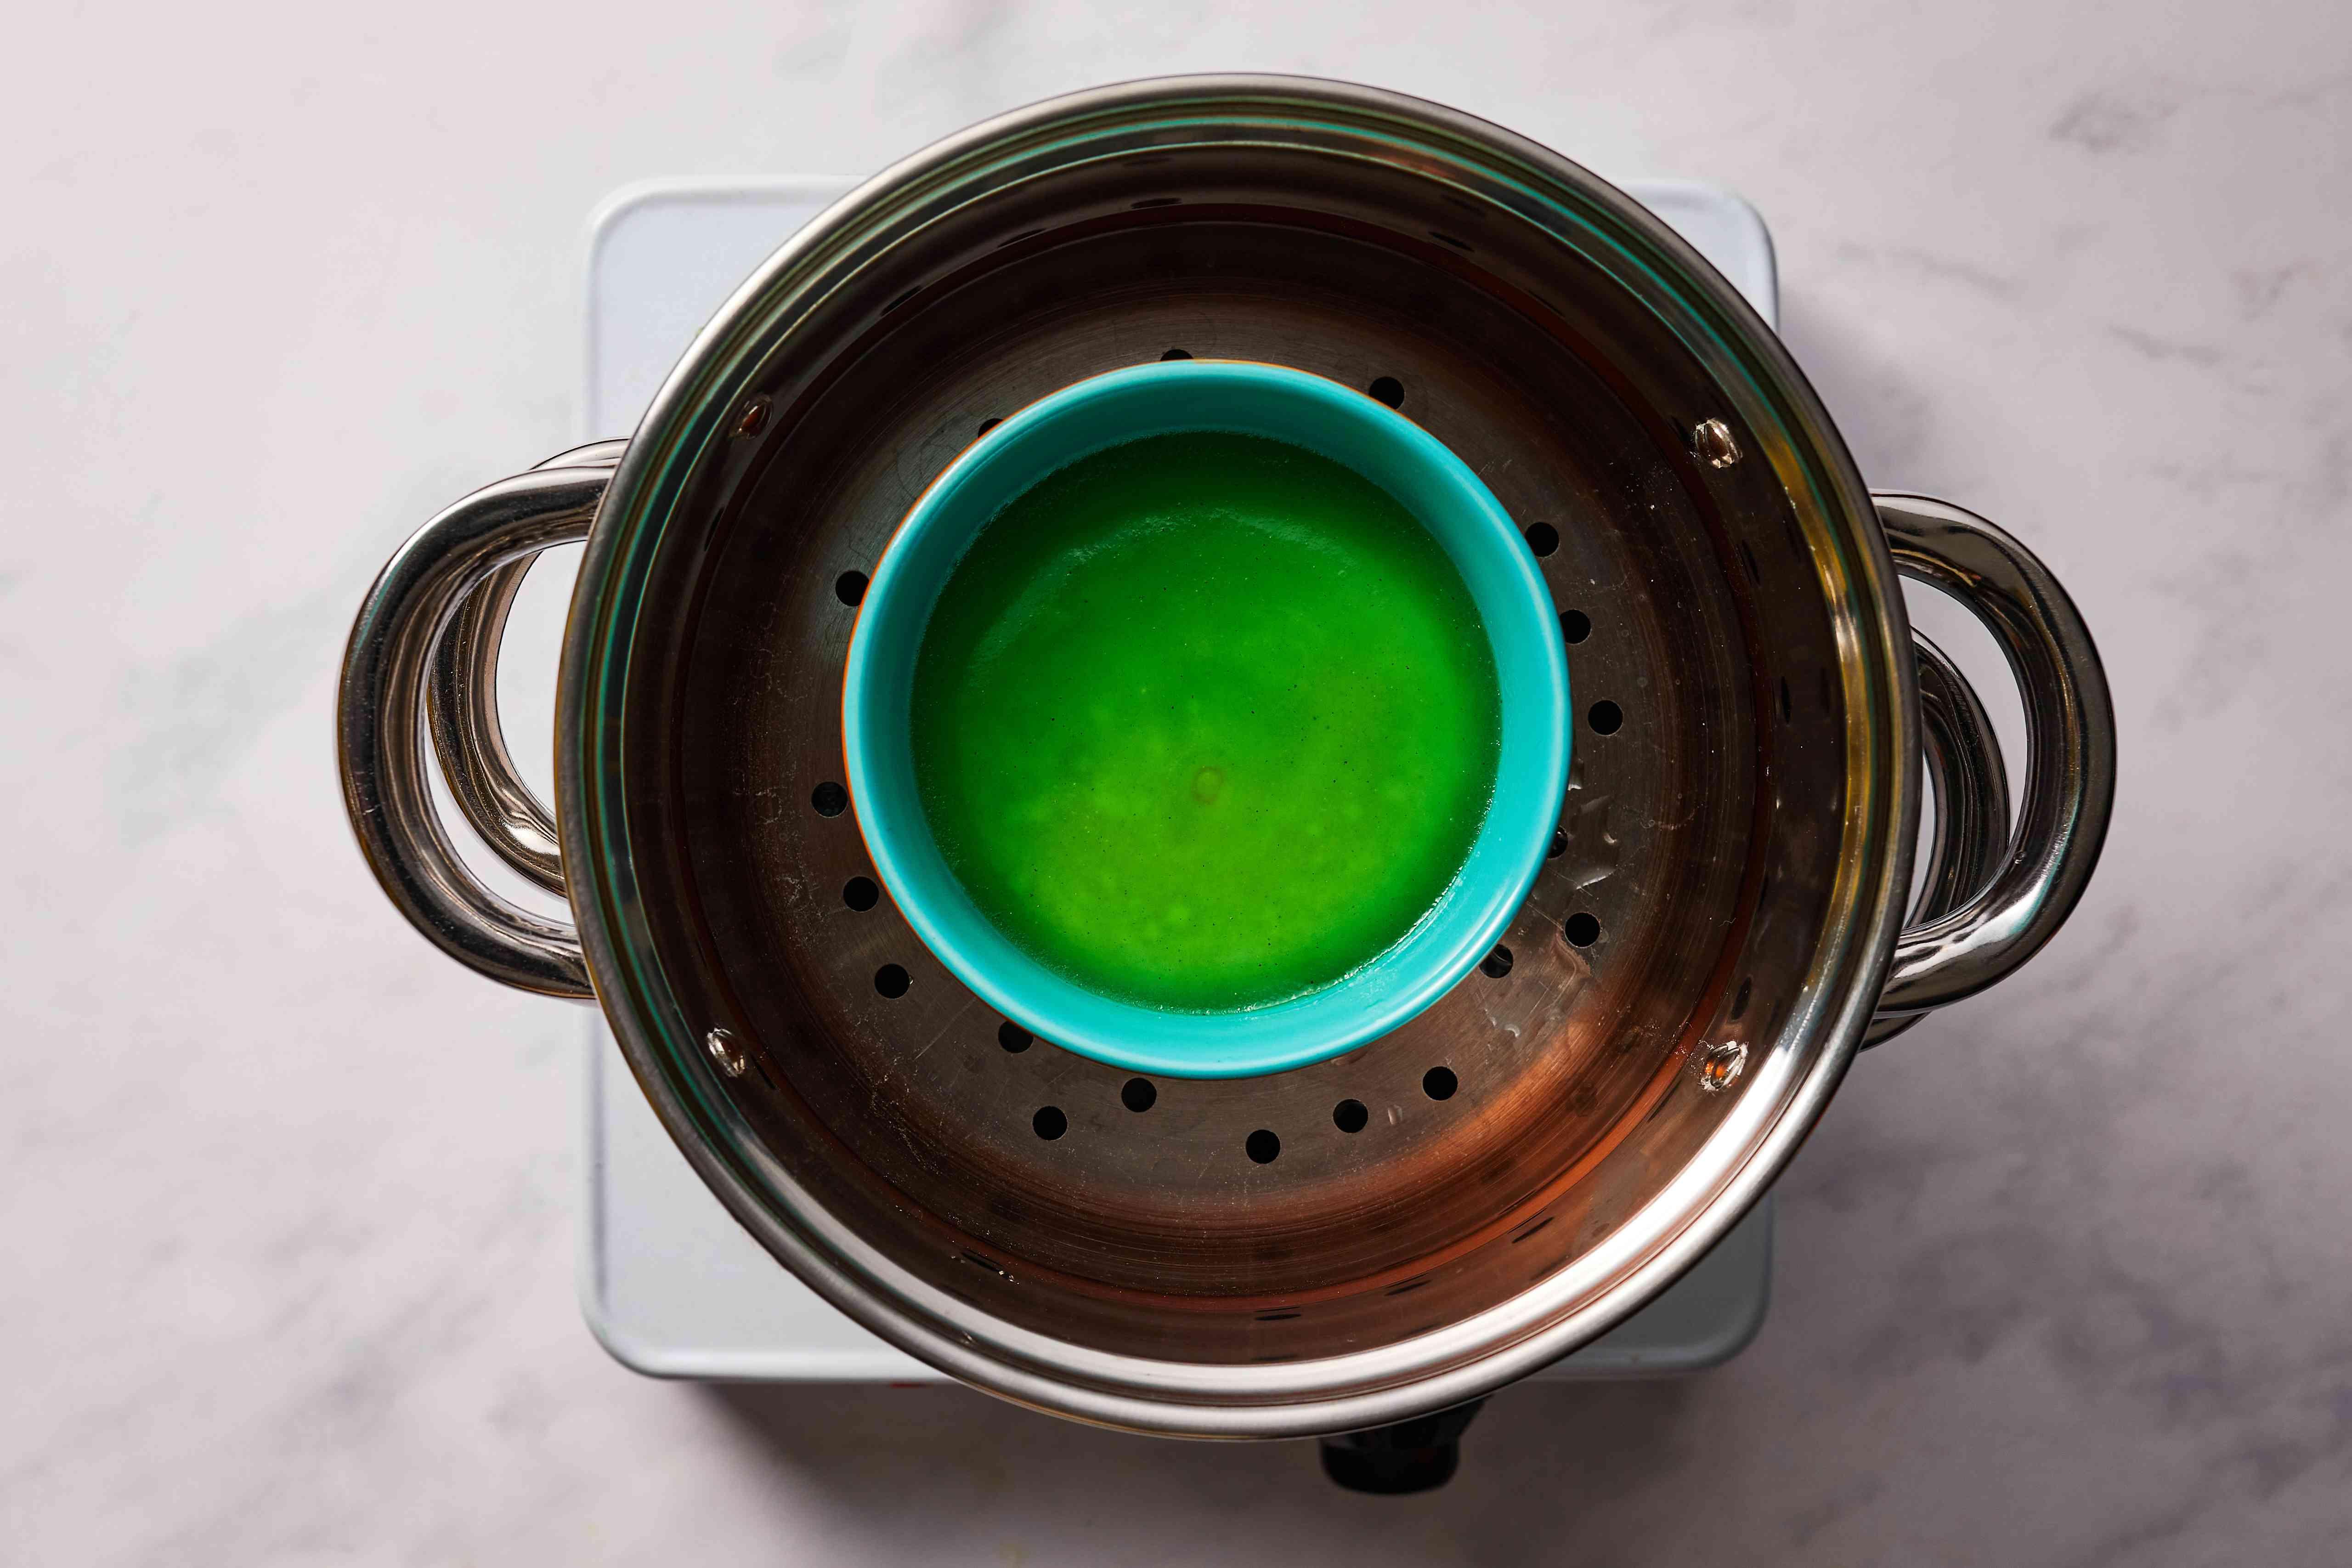 Vietnamese Pandan Rice and Mung Bean Cake in a ramekin in a steamer